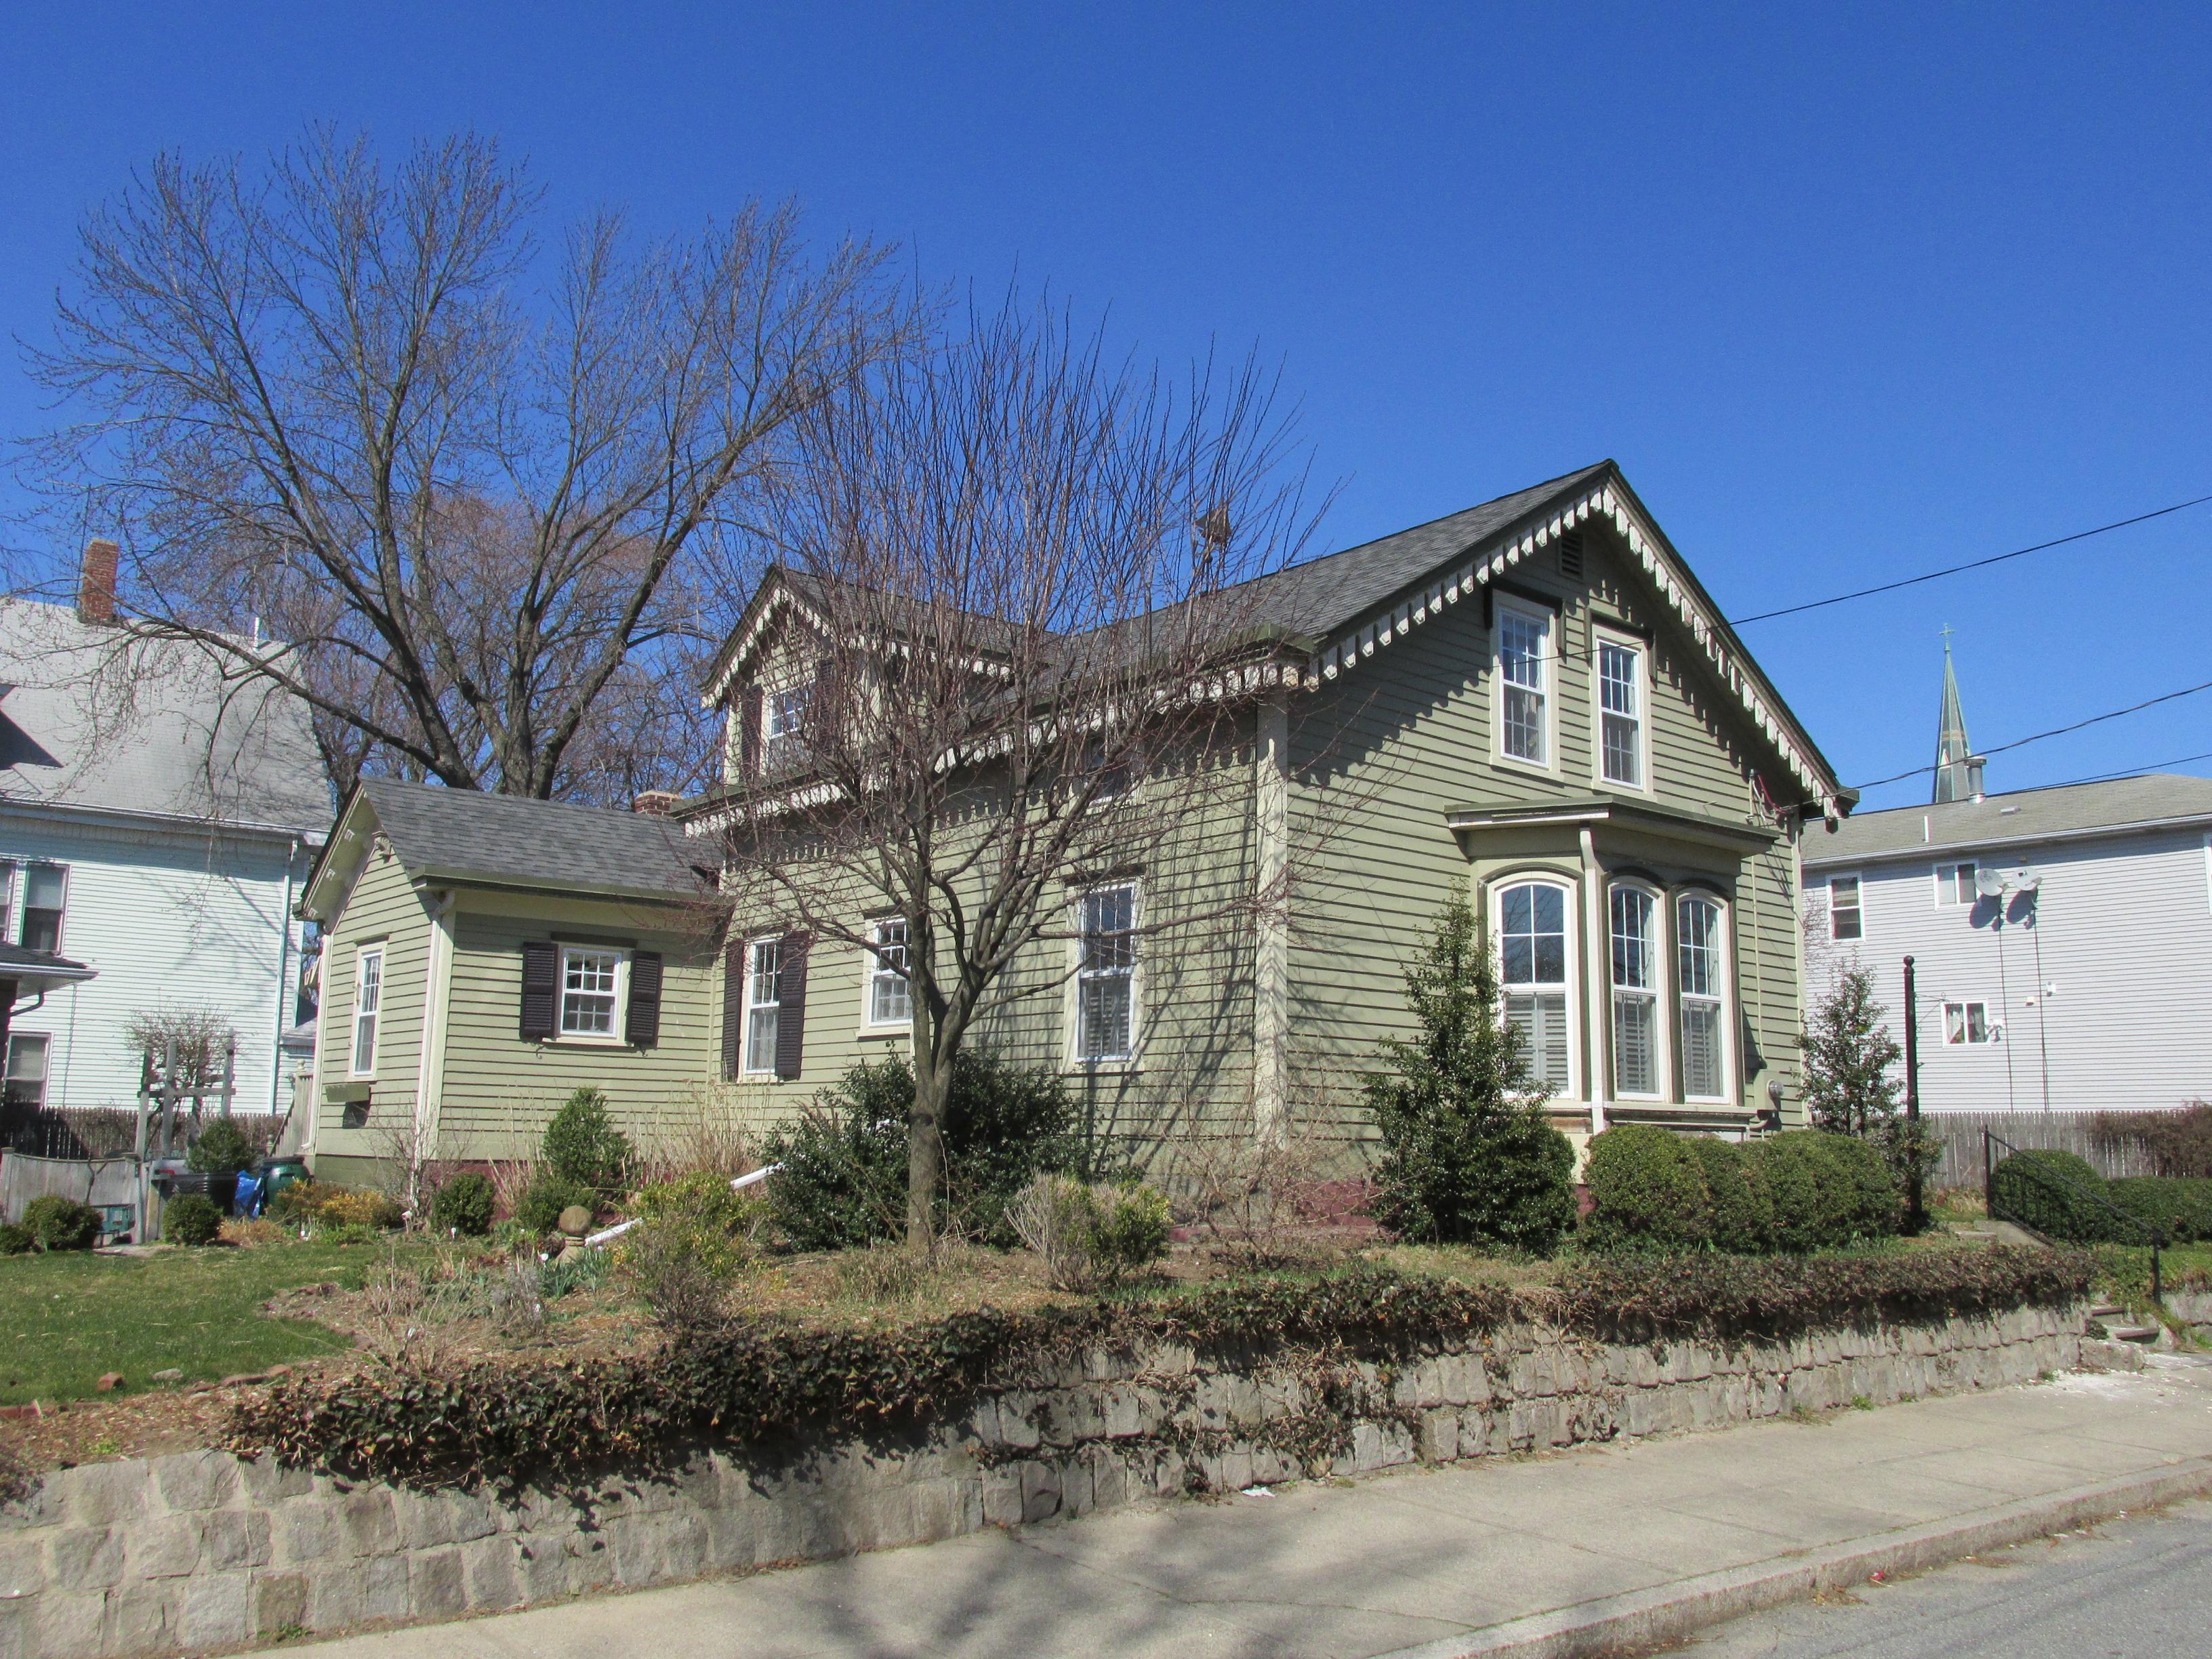 Charles Paynes Hus i Teaneck, New Jersey, U.S.